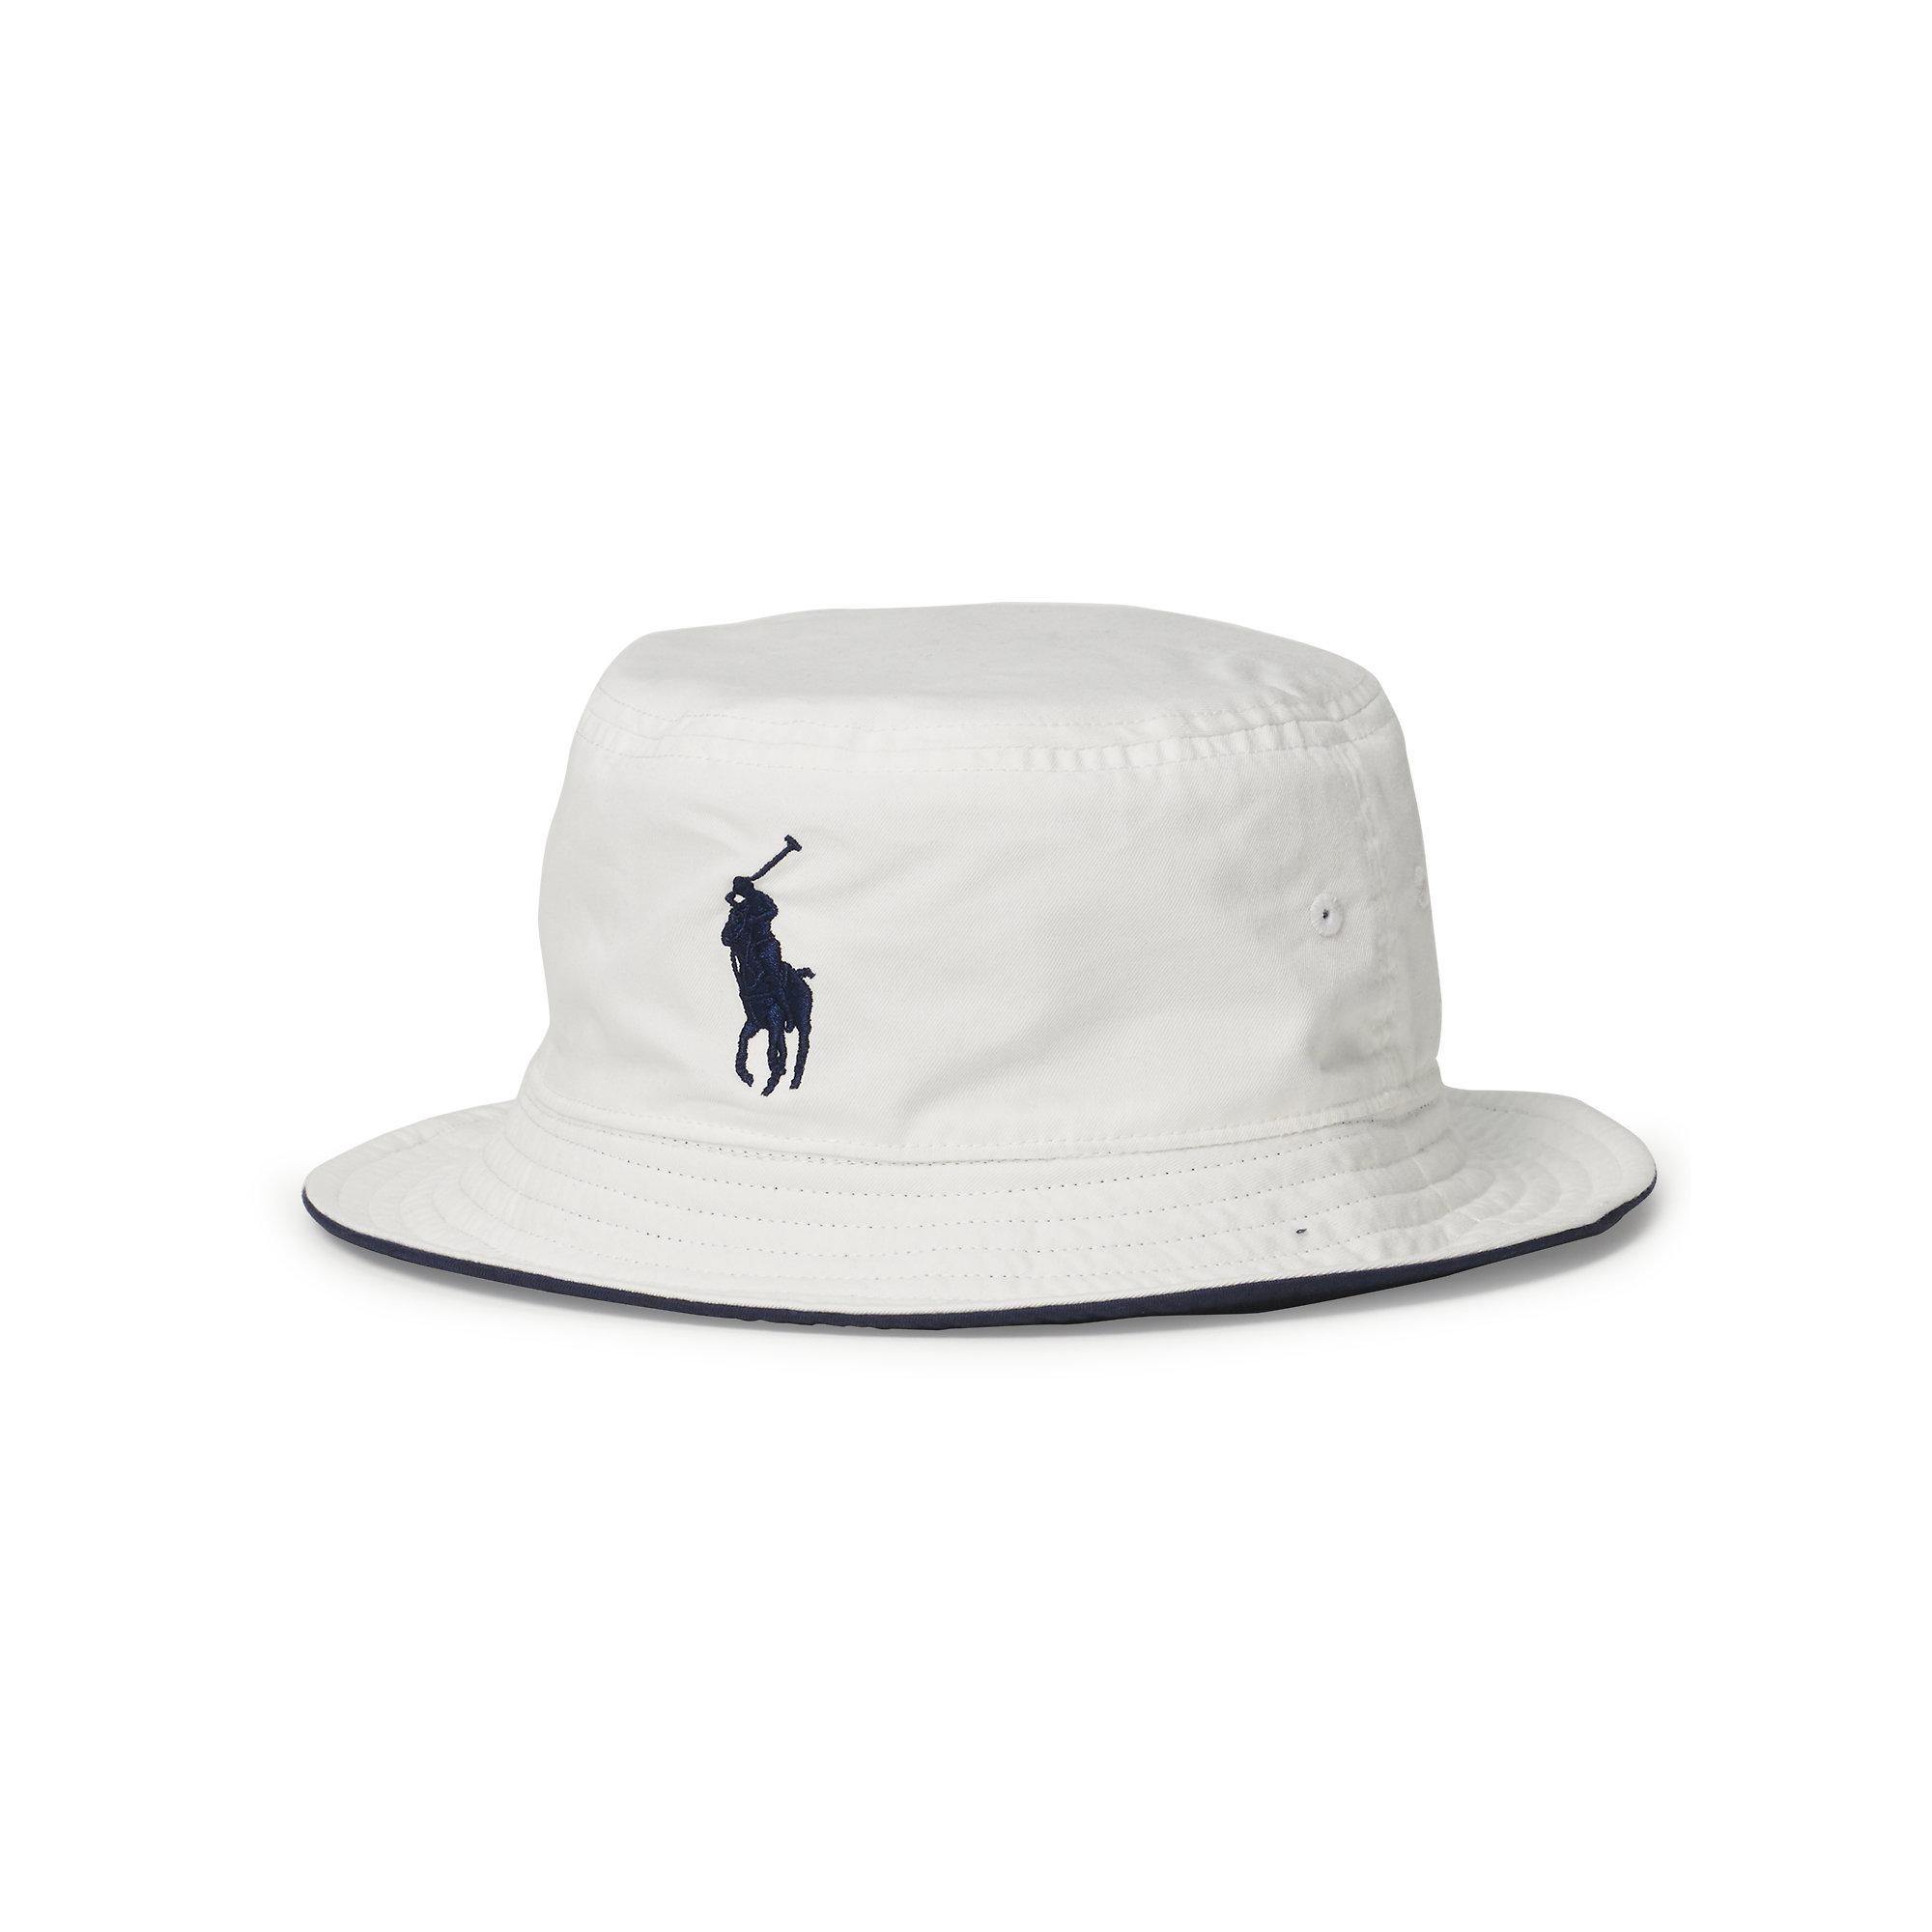 af8df3d4e4c Lyst - Polo Ralph Lauren Us Open Reversible Bucket Hat in White for Men